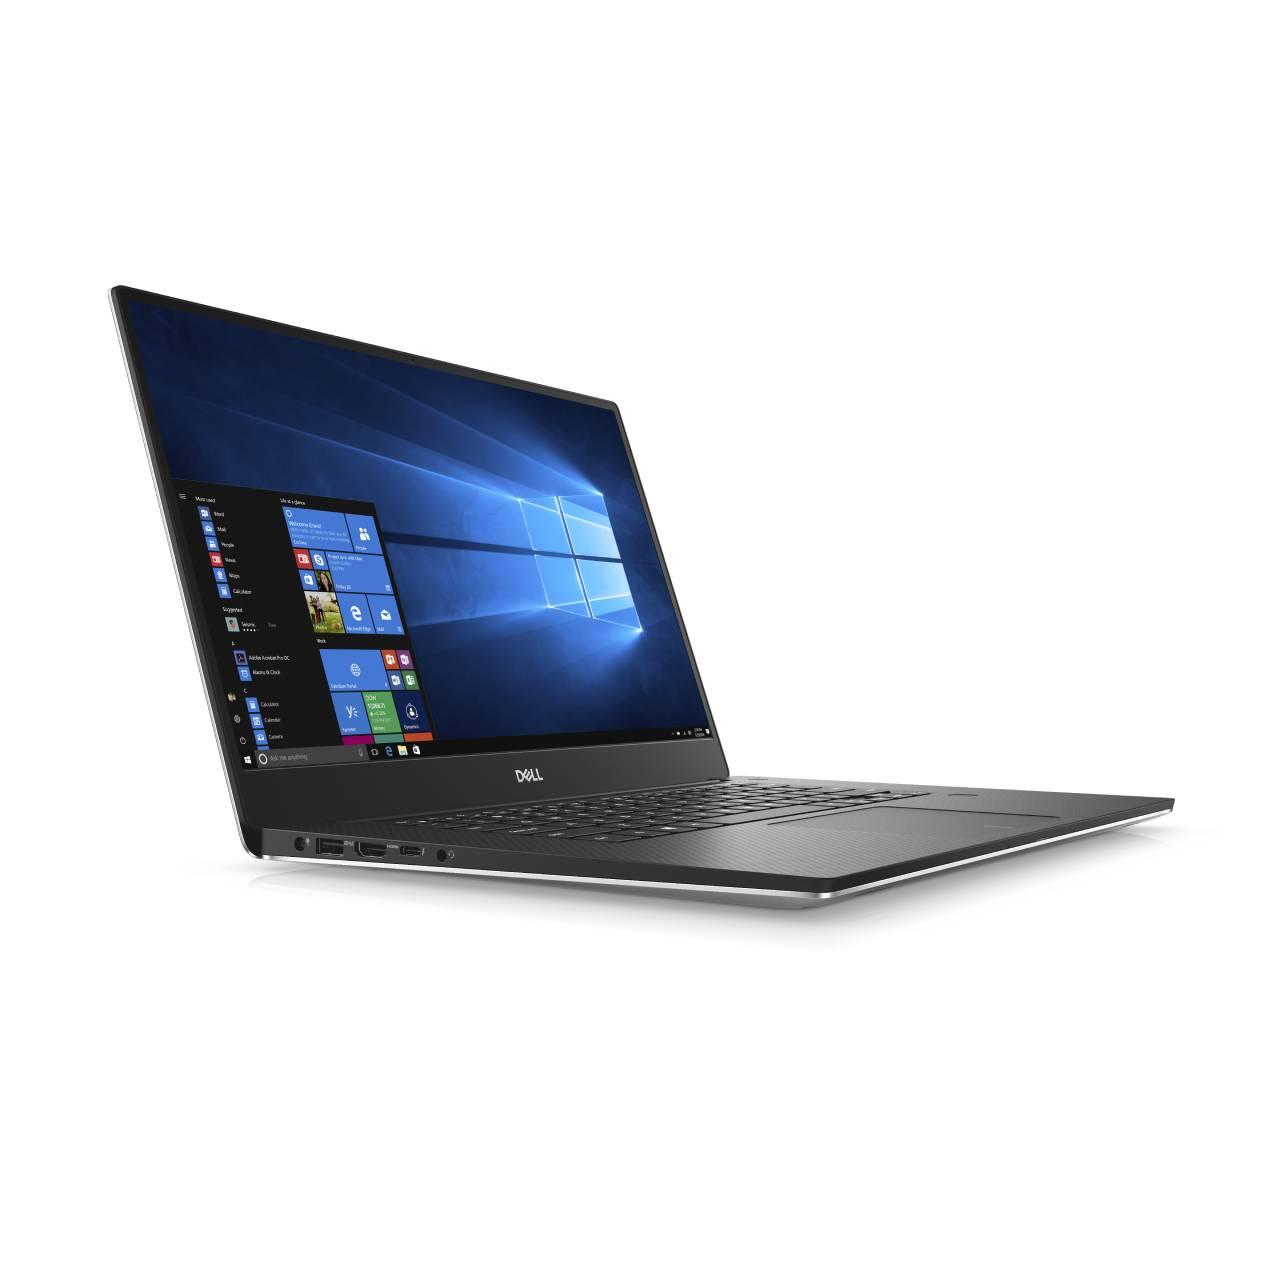 "Dell XPS 15 7590 Laptop: Intel Core I5-9300H, 15.6"" 1080p IPS, 8GB DDR4, 256GB SSD, Win 10 + $45.30 Back In Points $755.99 AC + Free Shipping @ Rakuten"